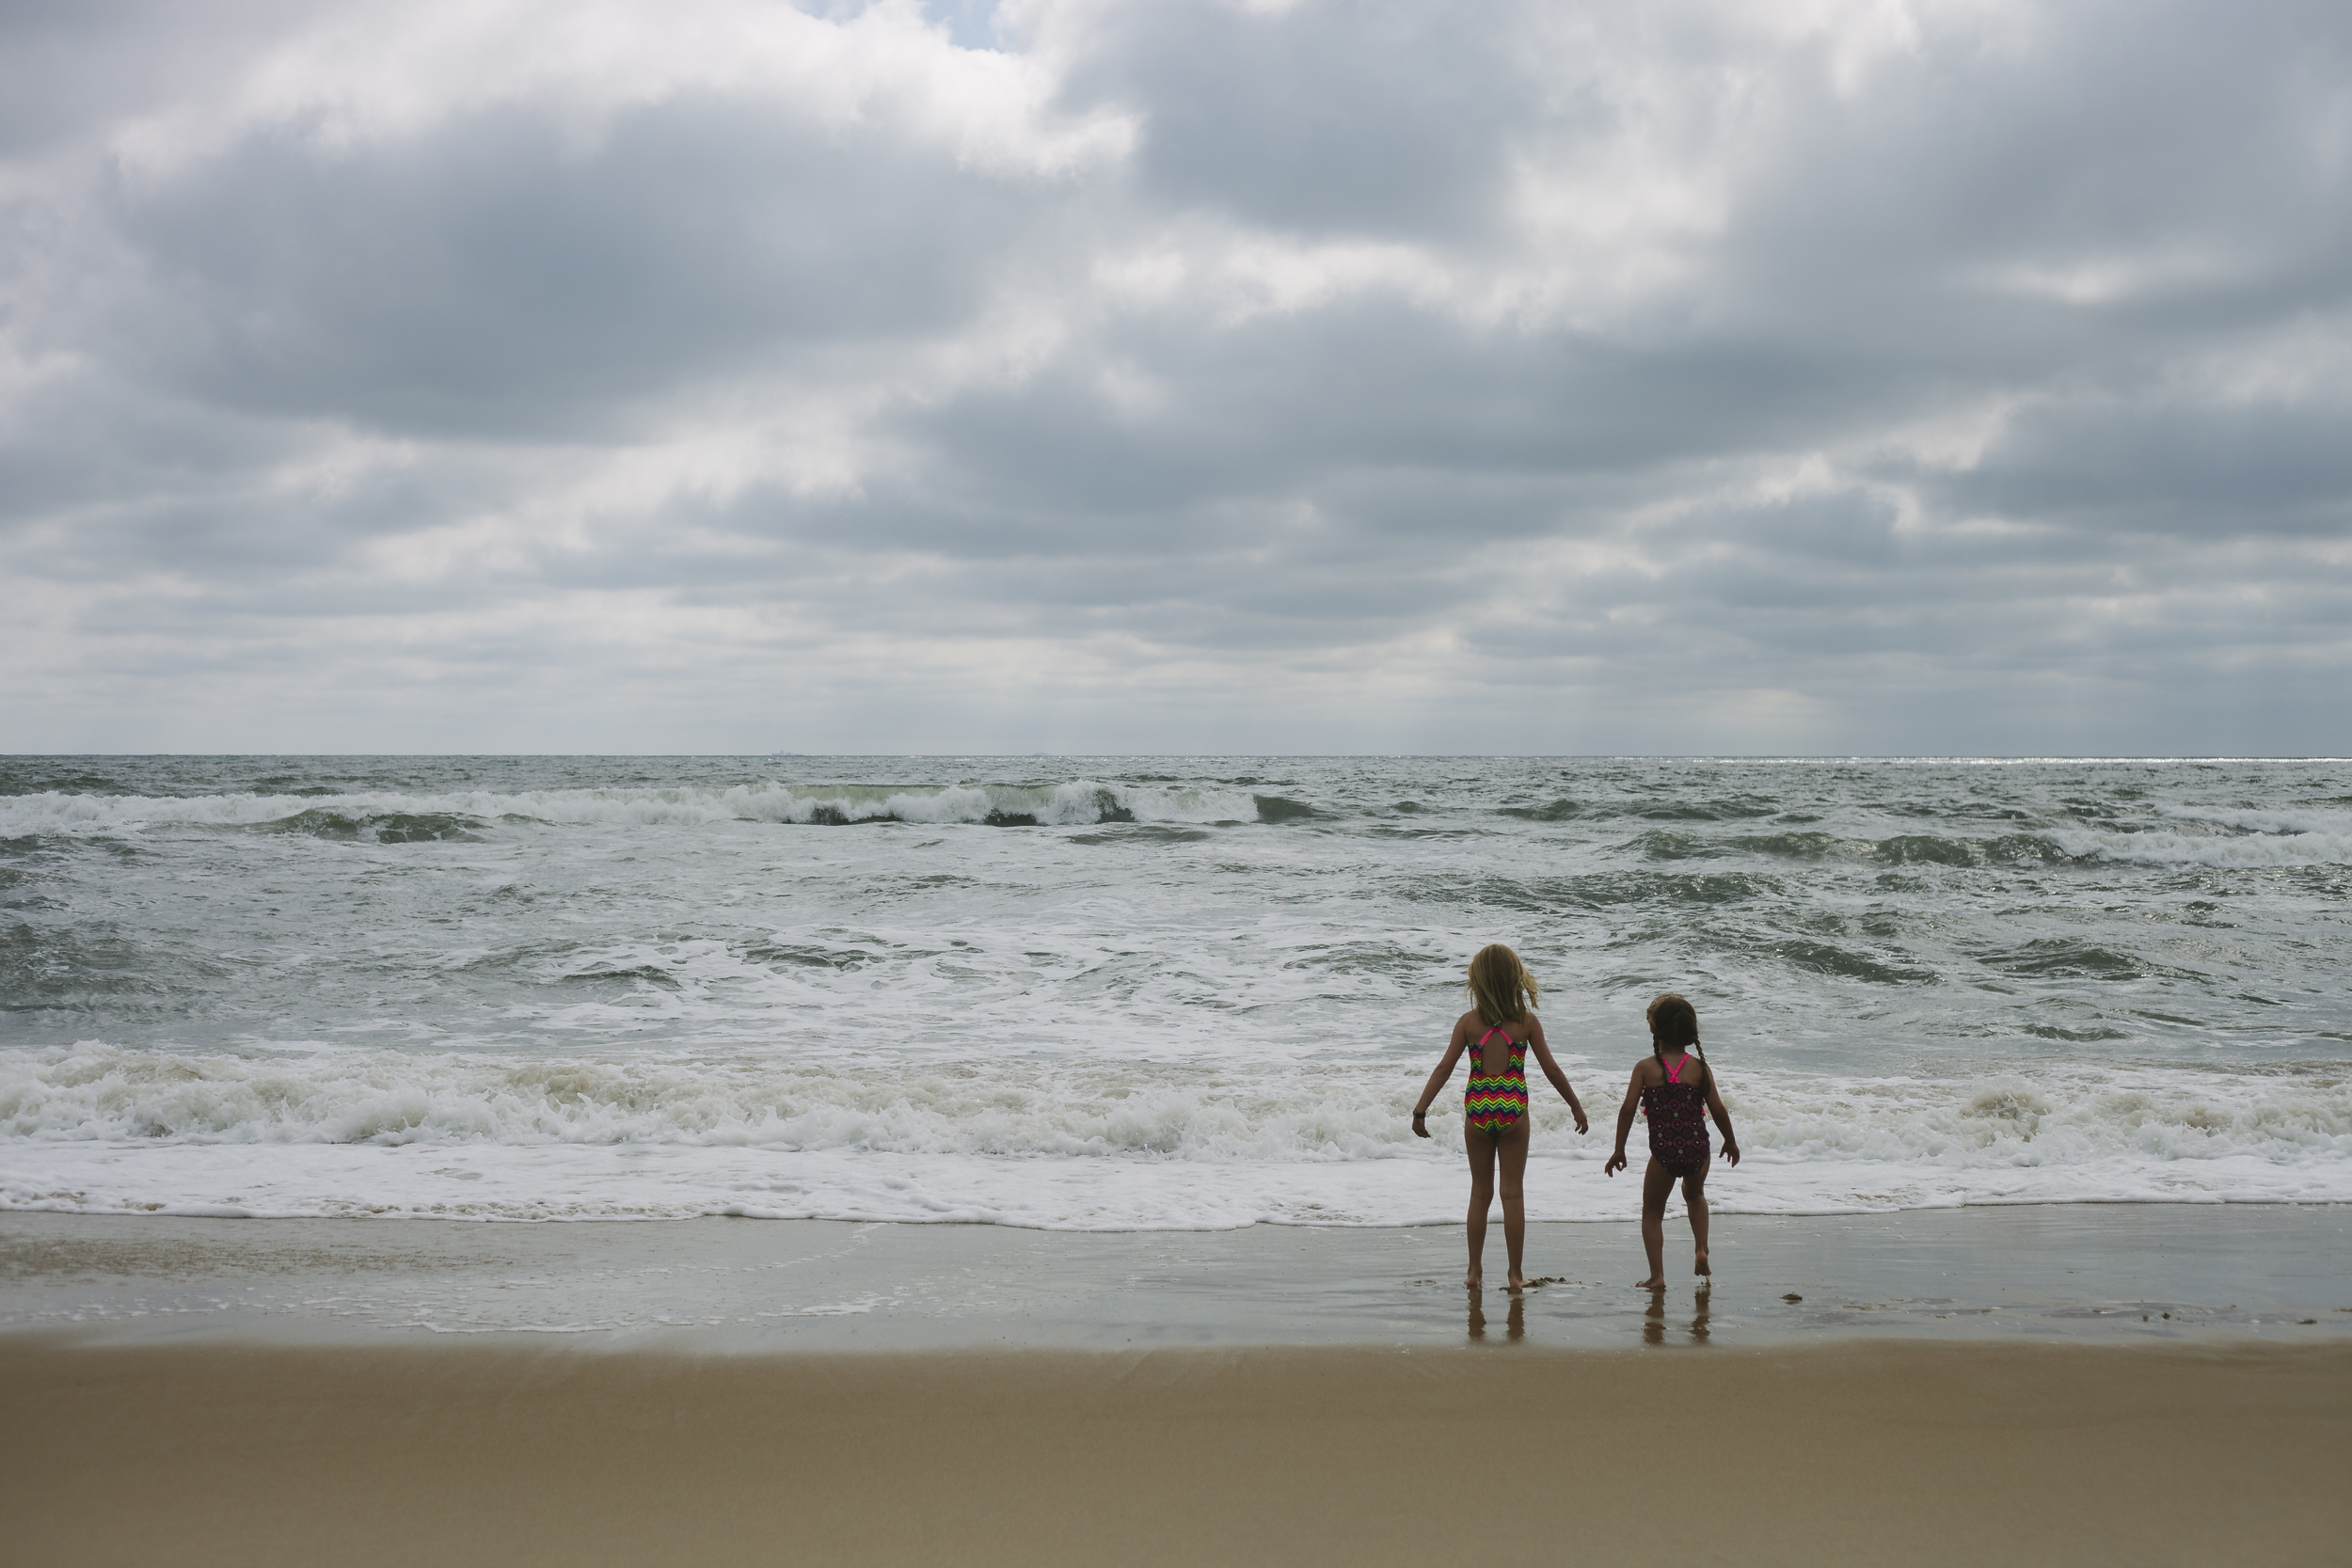 20160626_virginia beach_5503virginia beach vacation.jpg